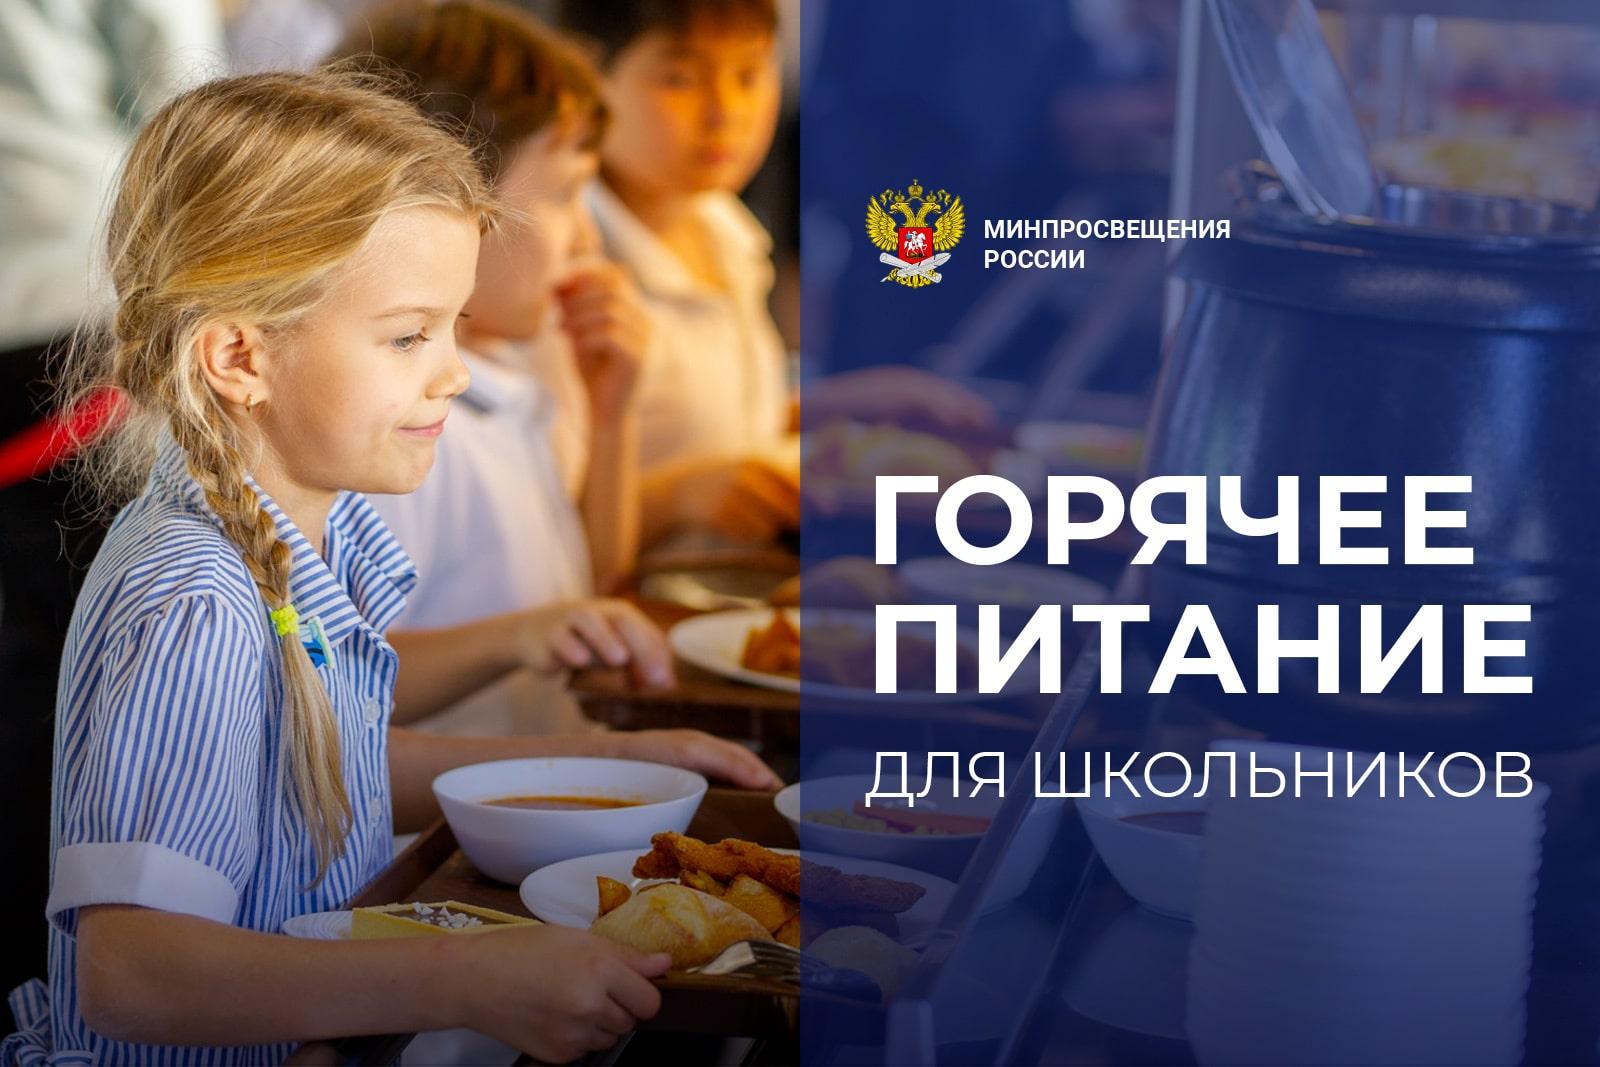 Завершена программа по обеспечению горячим питанием младших школьников